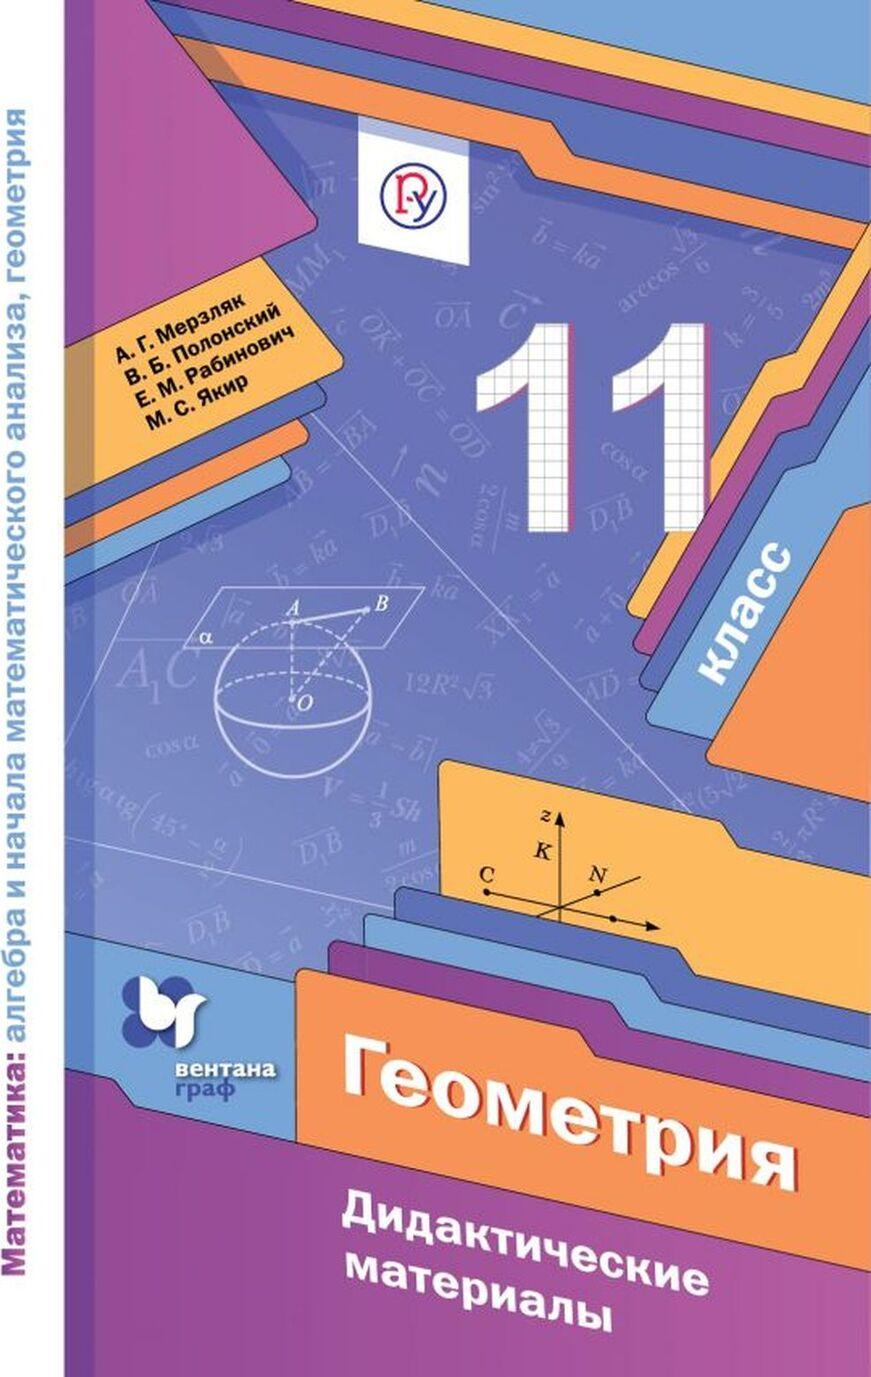 Geometrija. 11 klass. Didakticheskie materialy | Merzljak Arkadij Grigorevich, Jakir Mikhail Semenovich